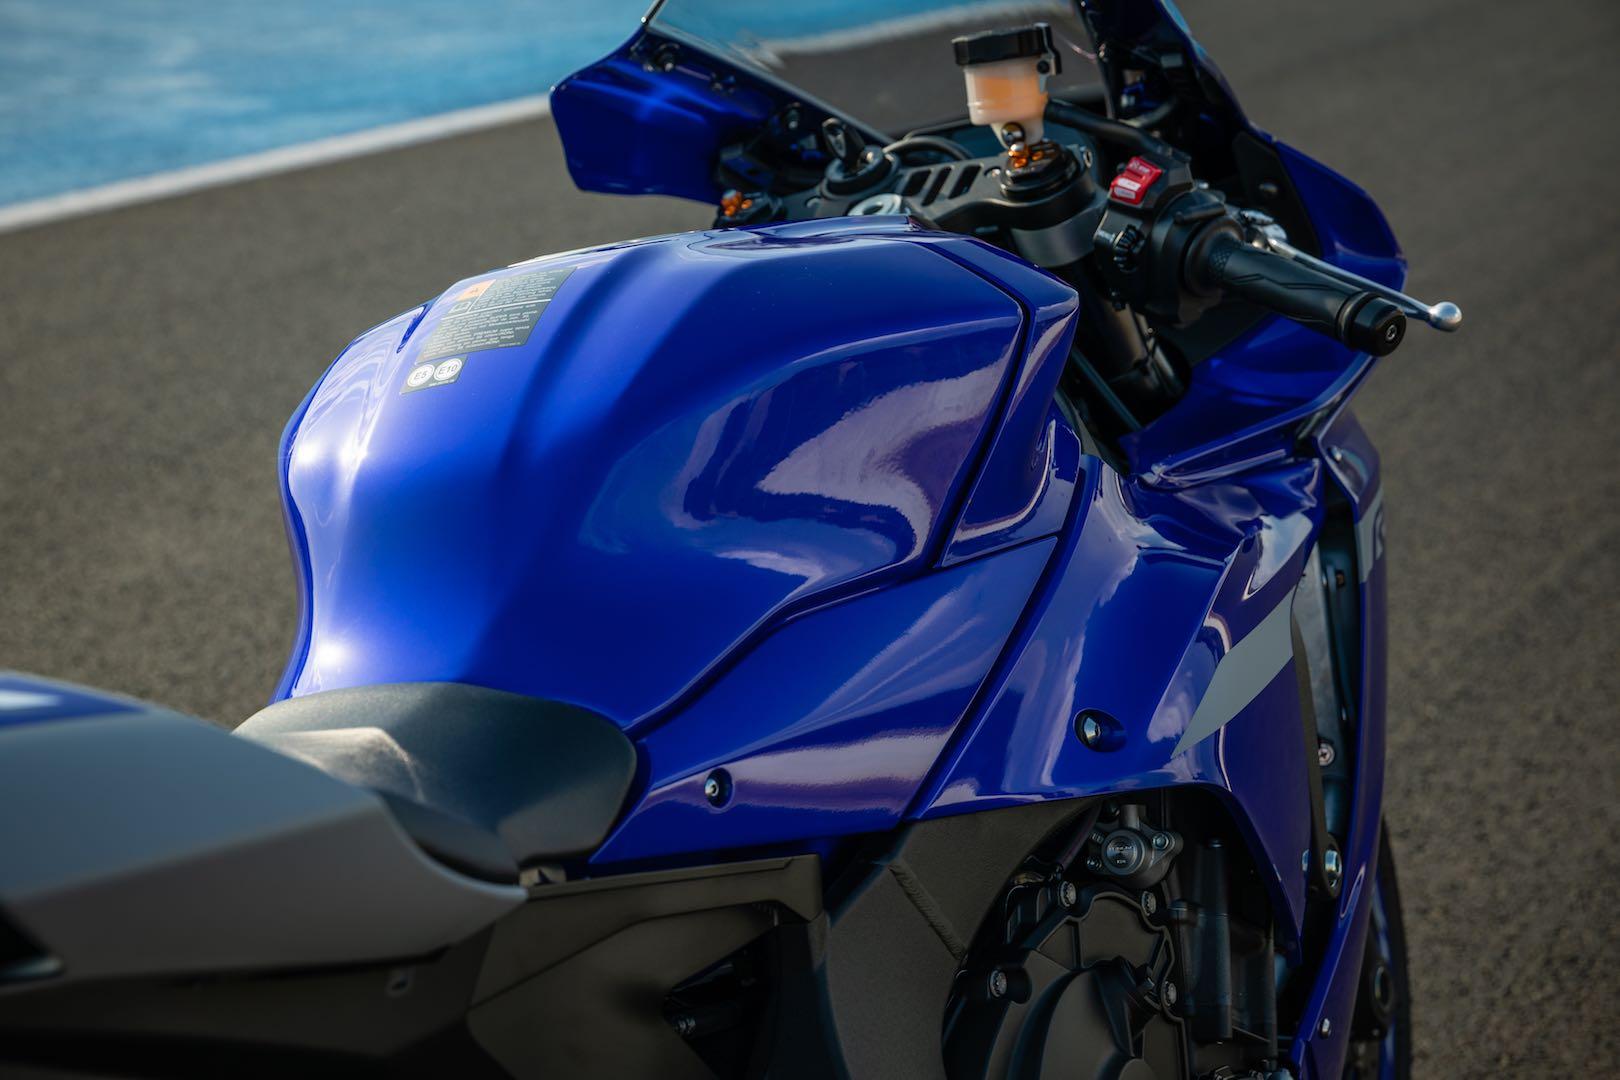 2020 Yamaha R1 test